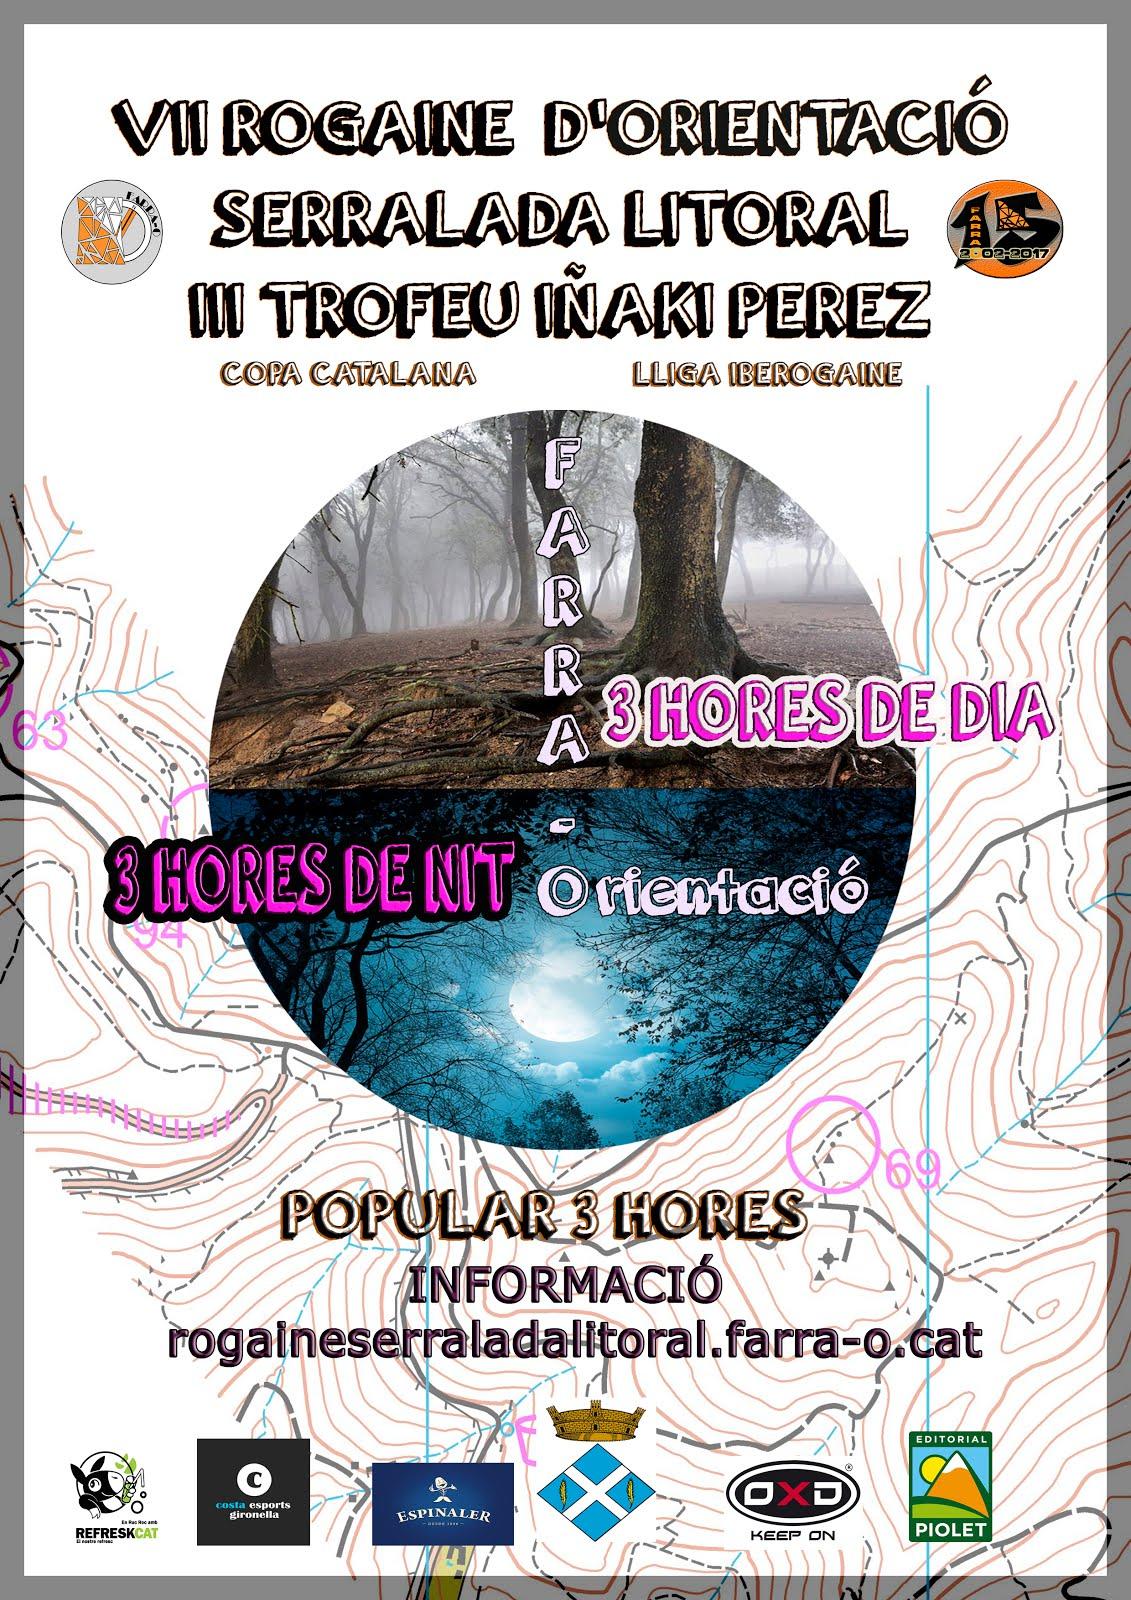 2 DE DESEMBRE - VII ROGAINE SERRALADA LITORAL - III TROFEU IÑAKI PEREZ